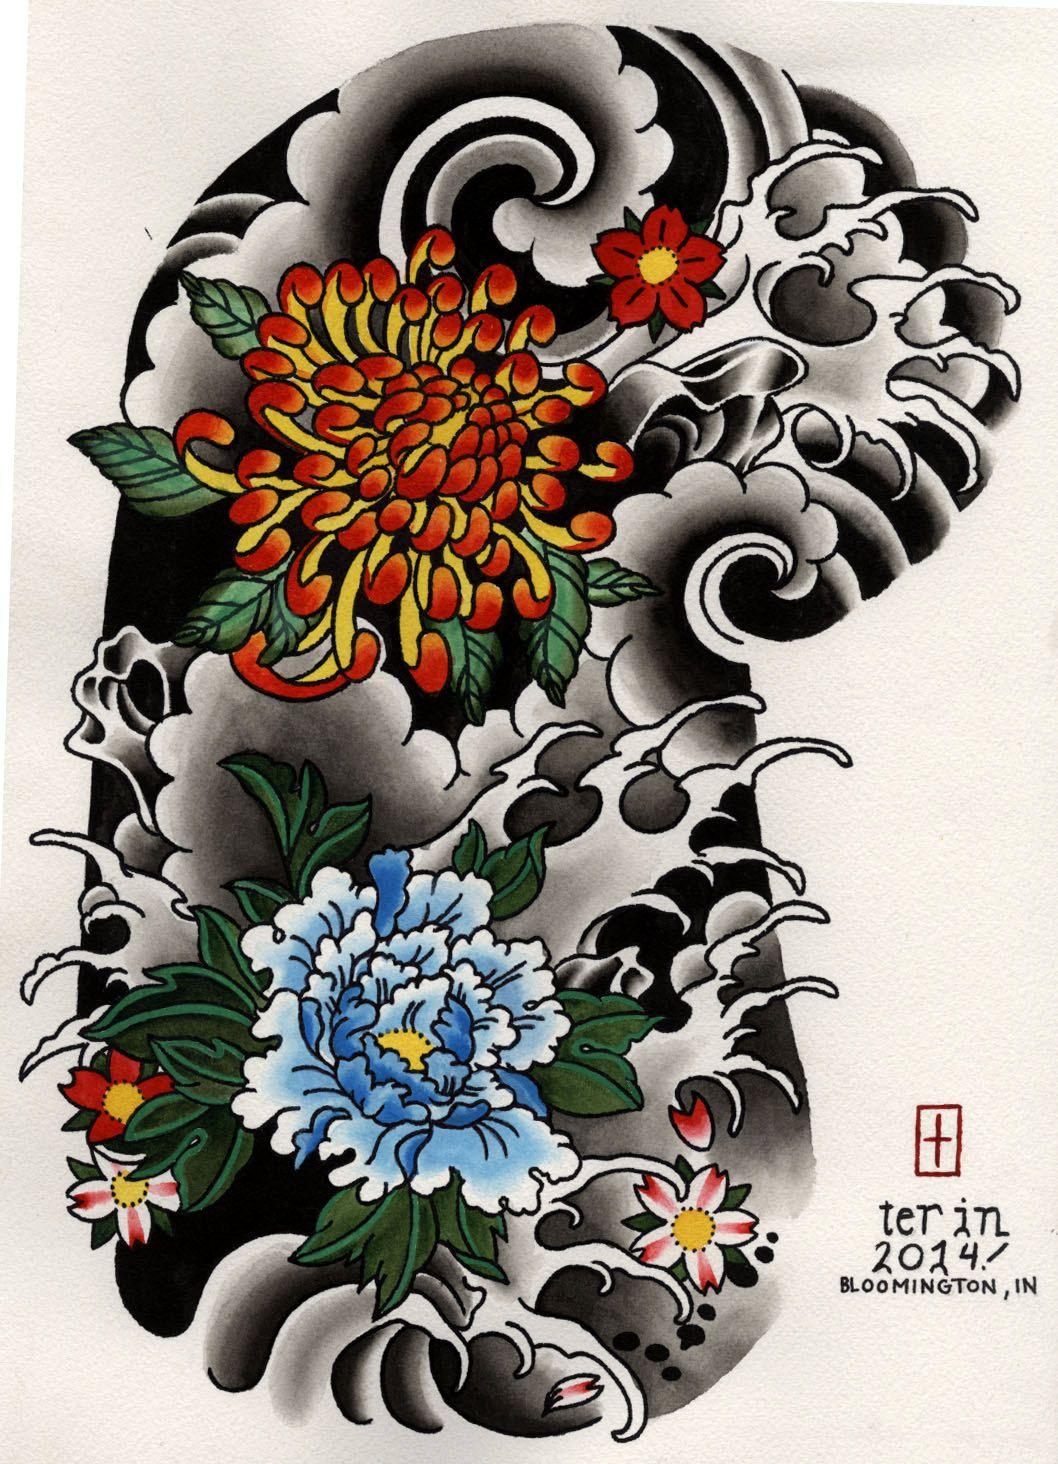 Japanese Floral Half Sleeve Tattoo Design Stuff to Buy